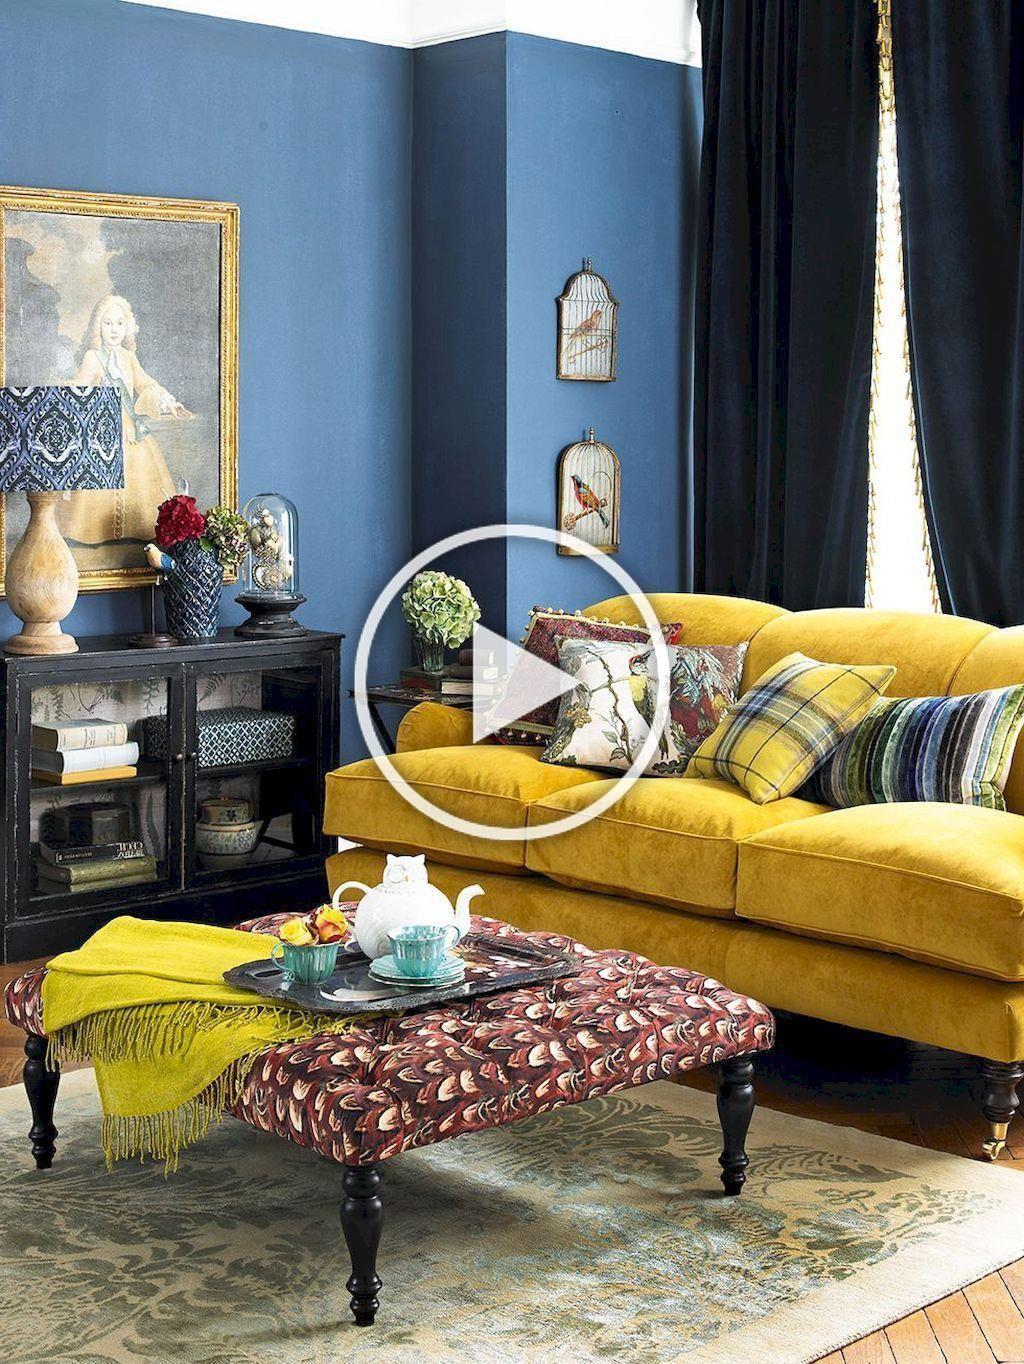 14 Inspiring Yellow Sofas For Living Room Decor Ideas In 2020 Yellow Sofa Design Yellow Sofa Blue Living Room